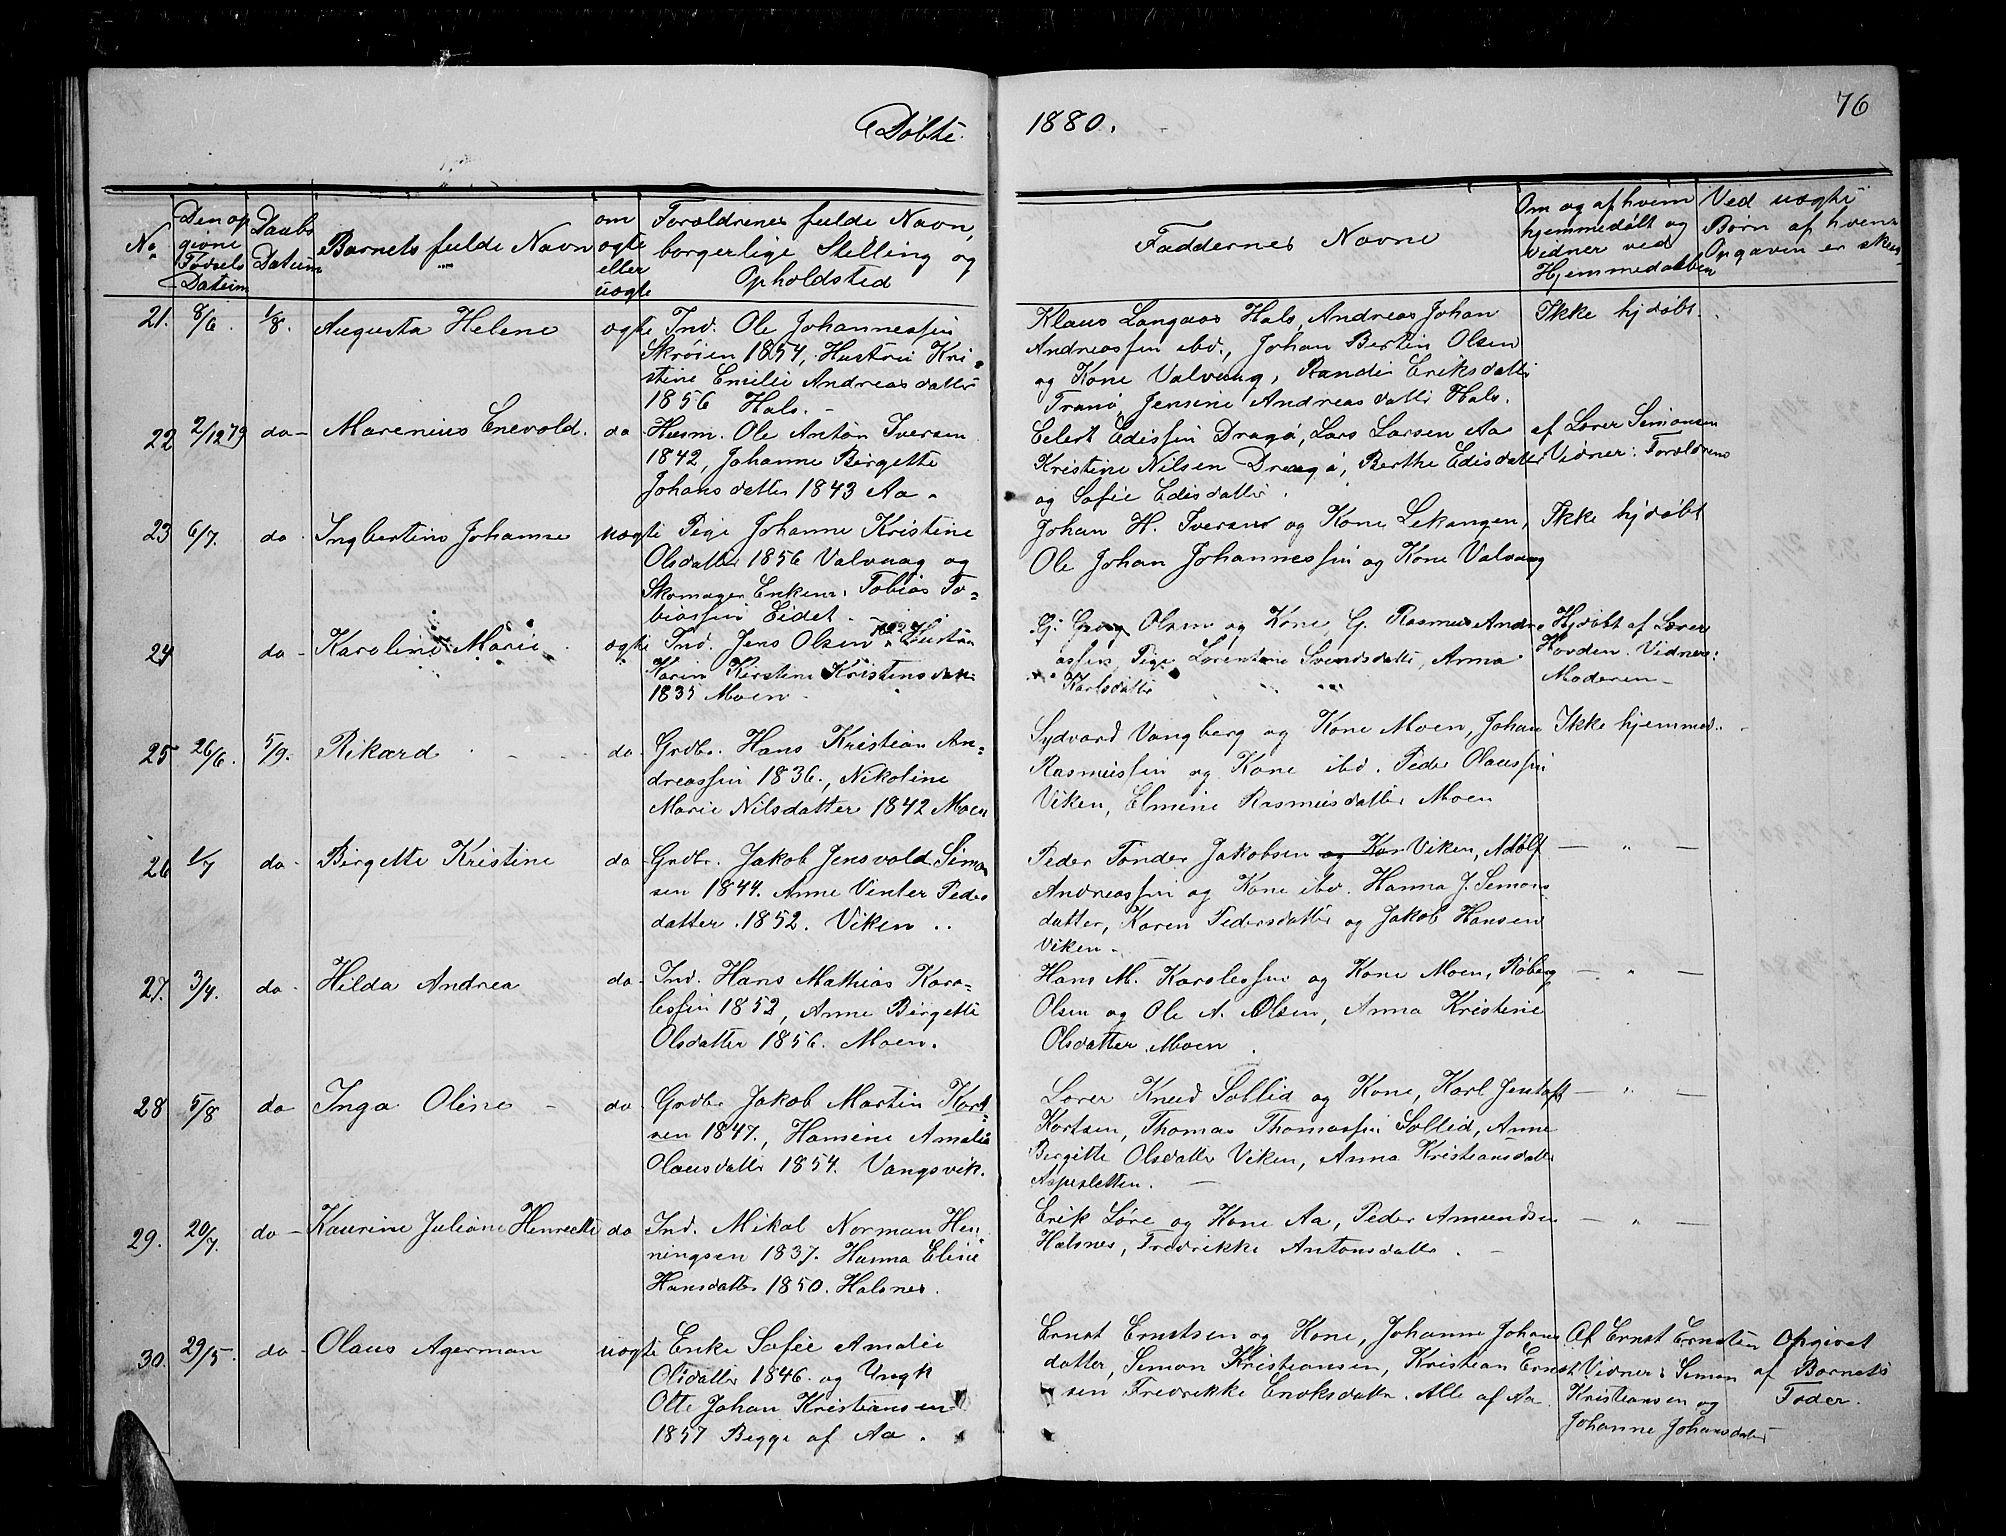 SATØ, Tranøy sokneprestkontor, I/Ia/Iab/L0003klokker: Klokkerbok nr. 3, 1861-1887, s. 76